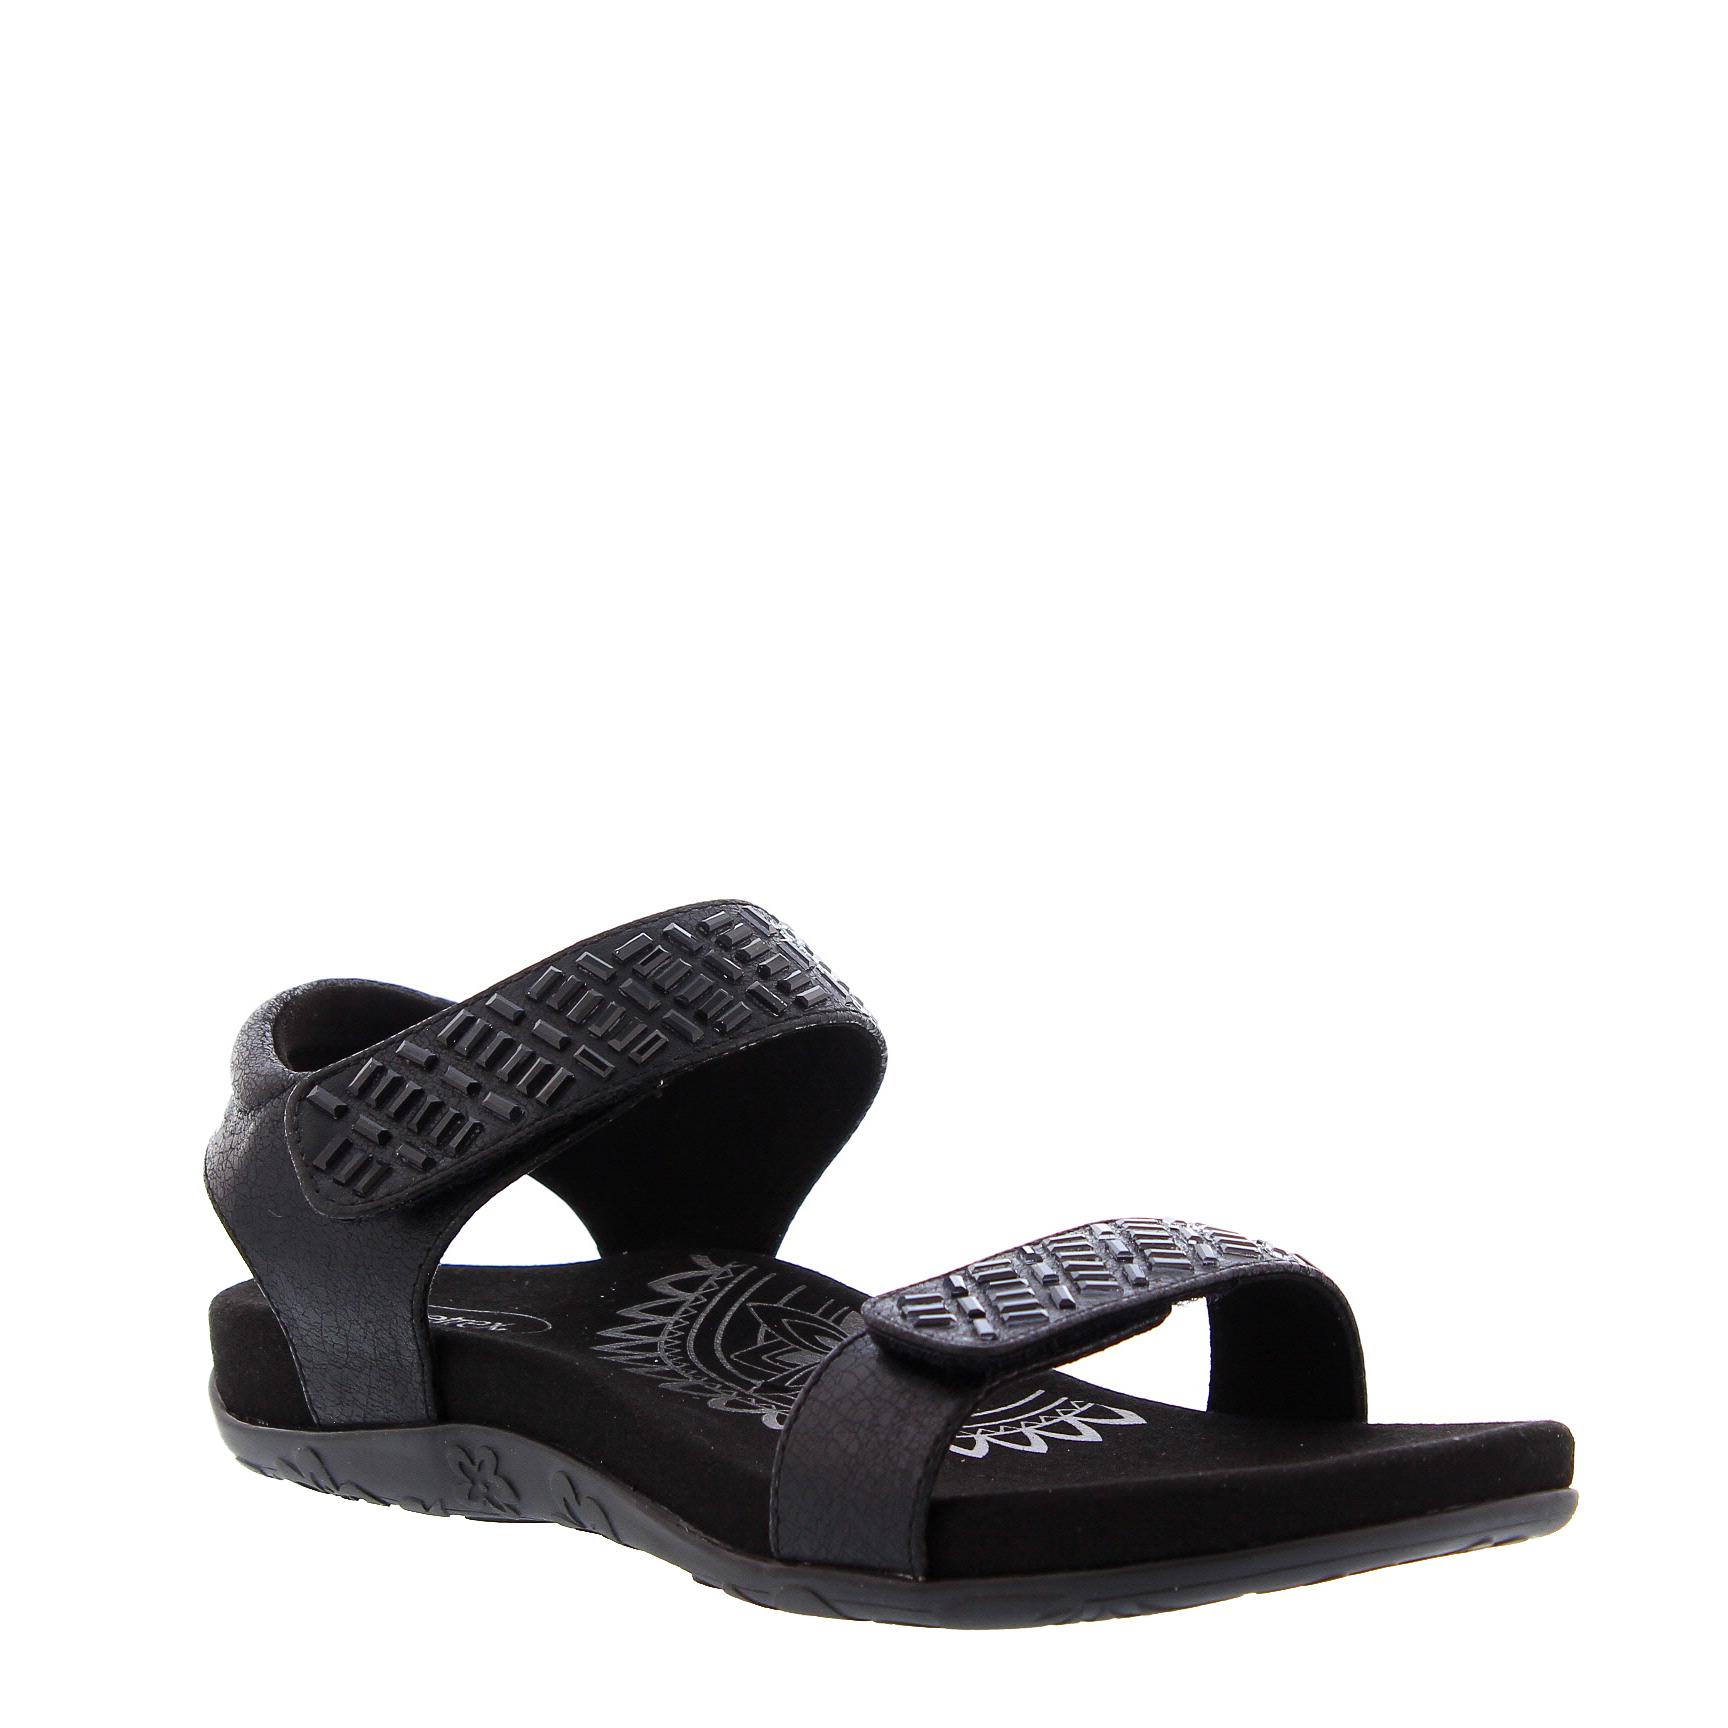 Aetrex Marcy Walking Sandal